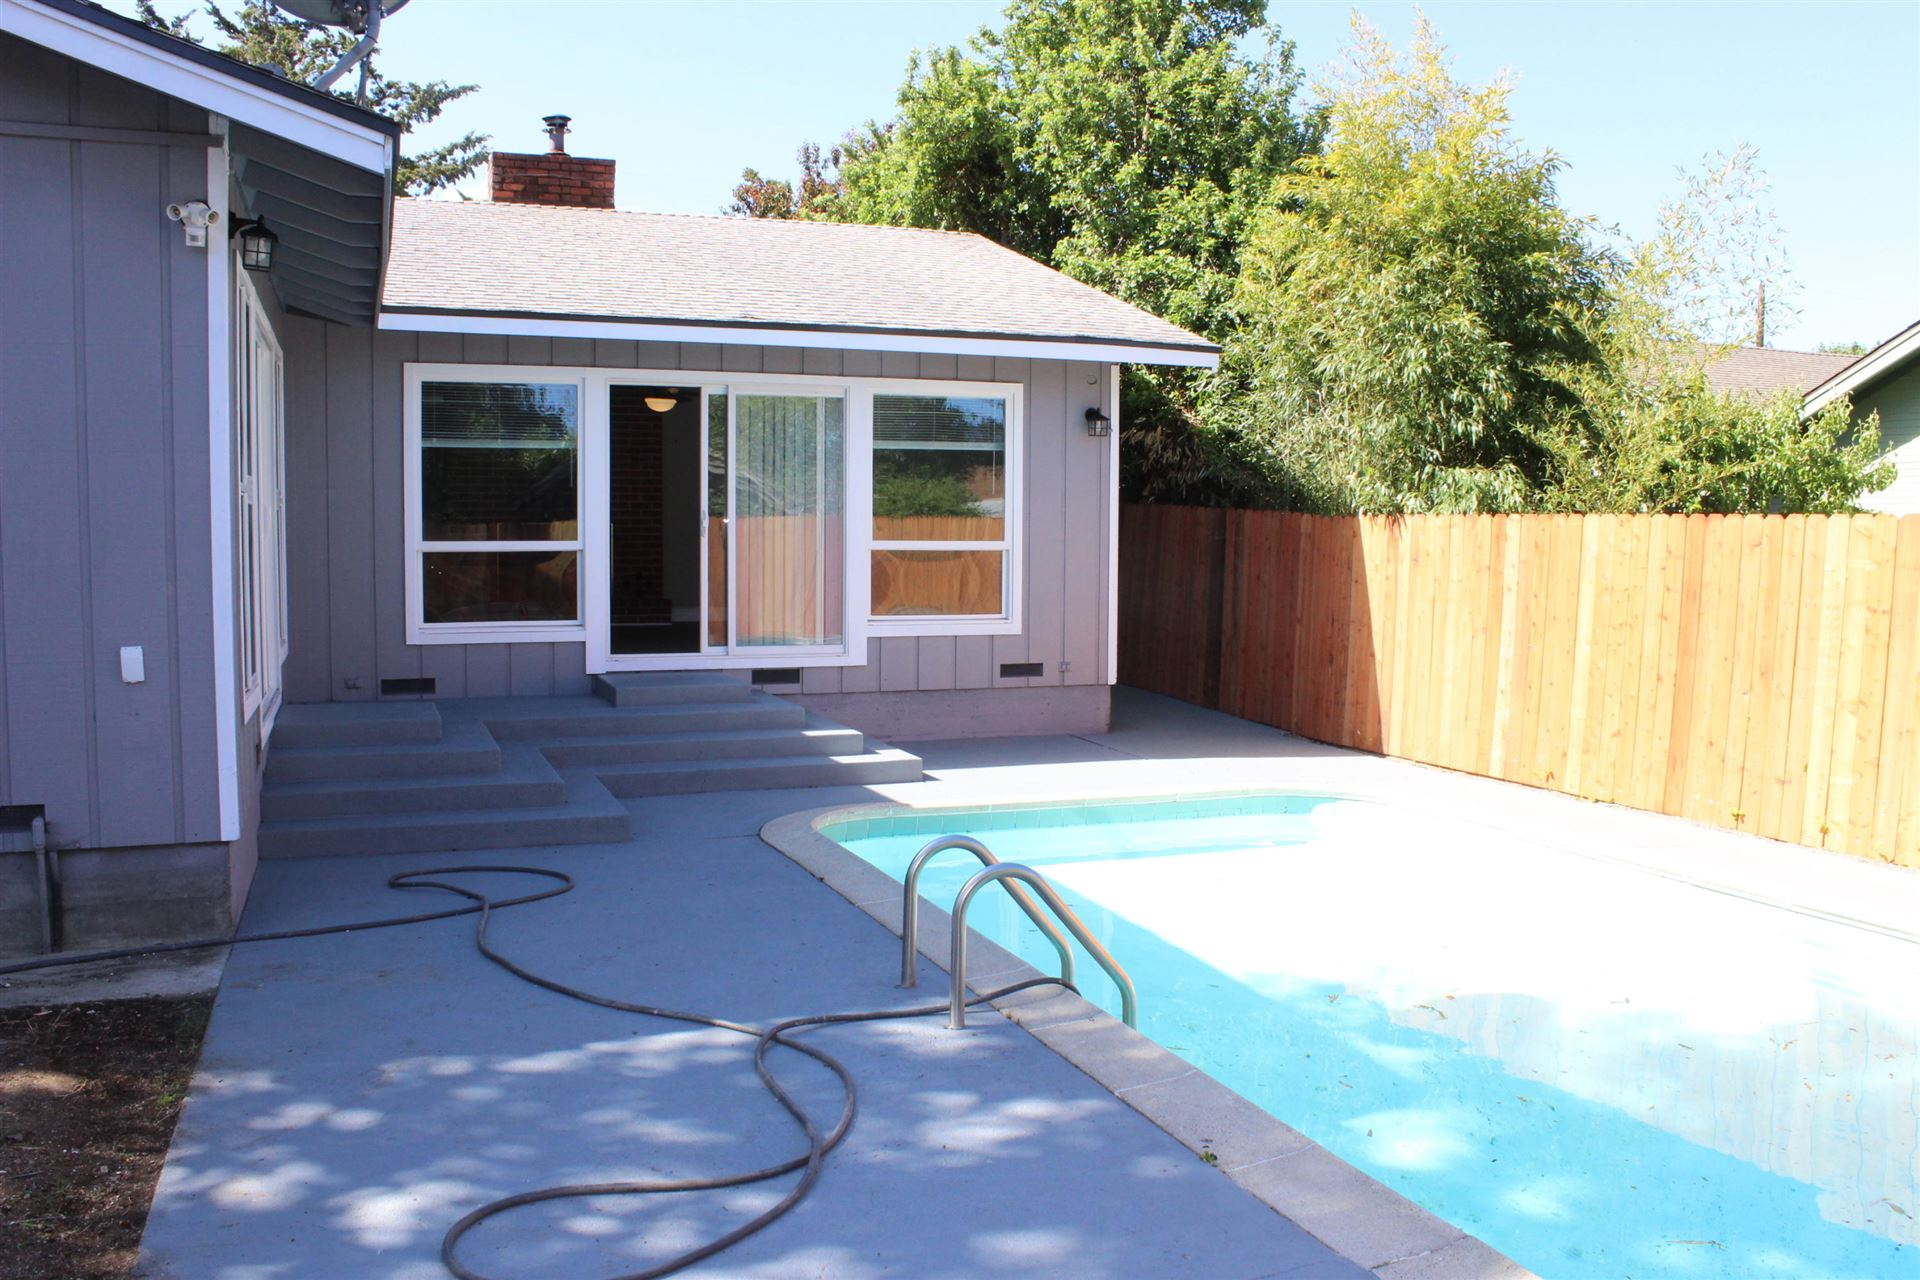 507 Maple Lane, Garberville, CA 95542 - MLS#: 259030